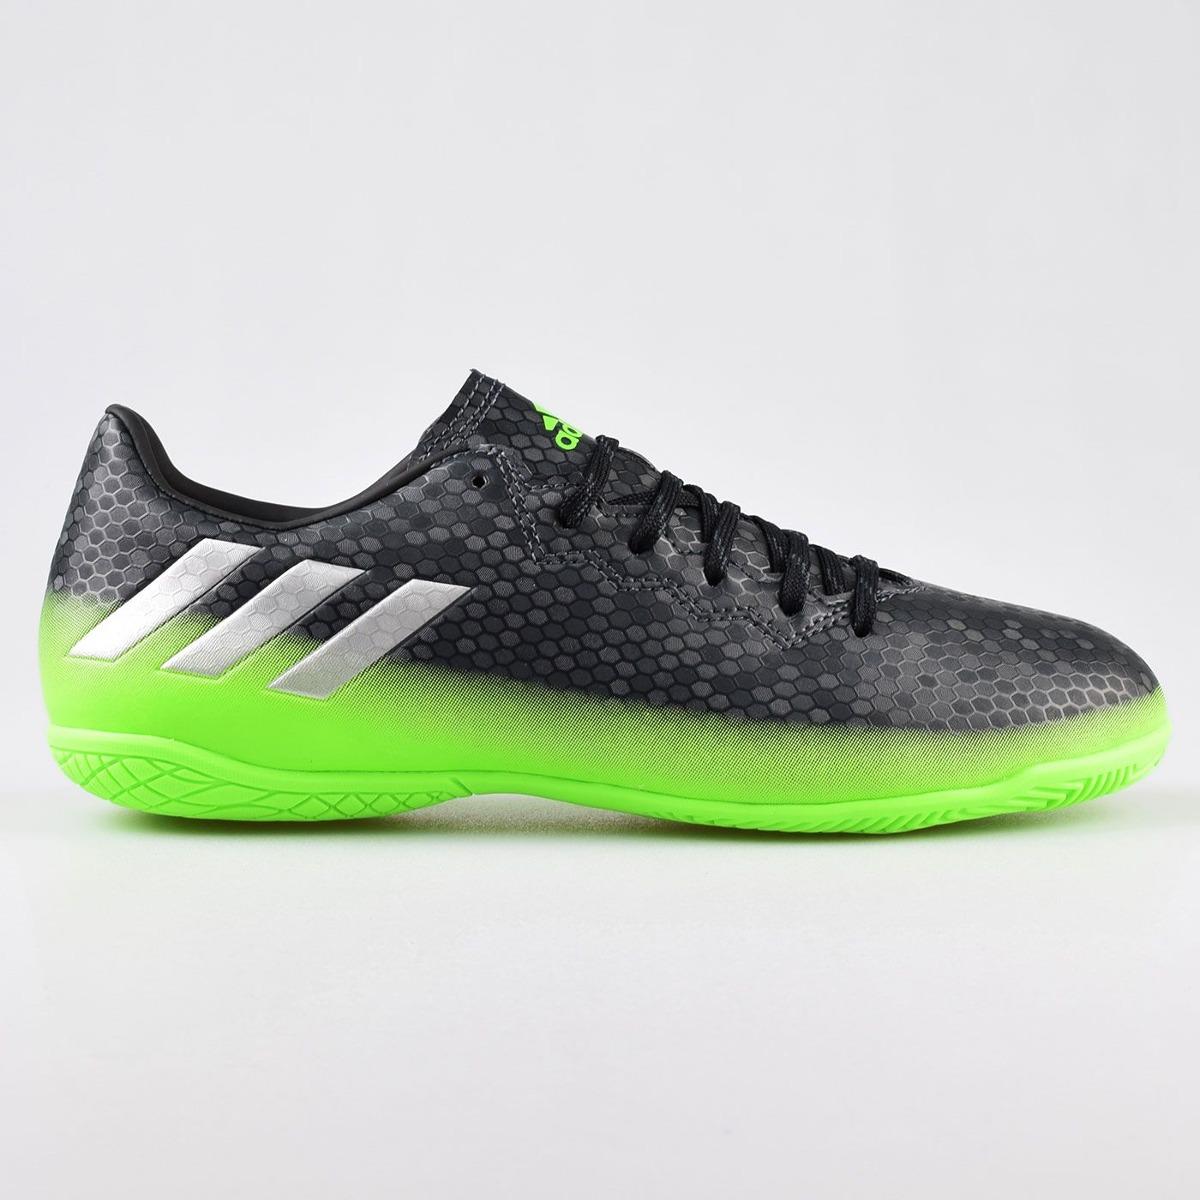 69bd6b9665518 tênis de futsal chuteira adidas messi 16.4 in original +nf. Carregando  zoom... futsal chuteira adidas. Carregando zoom.